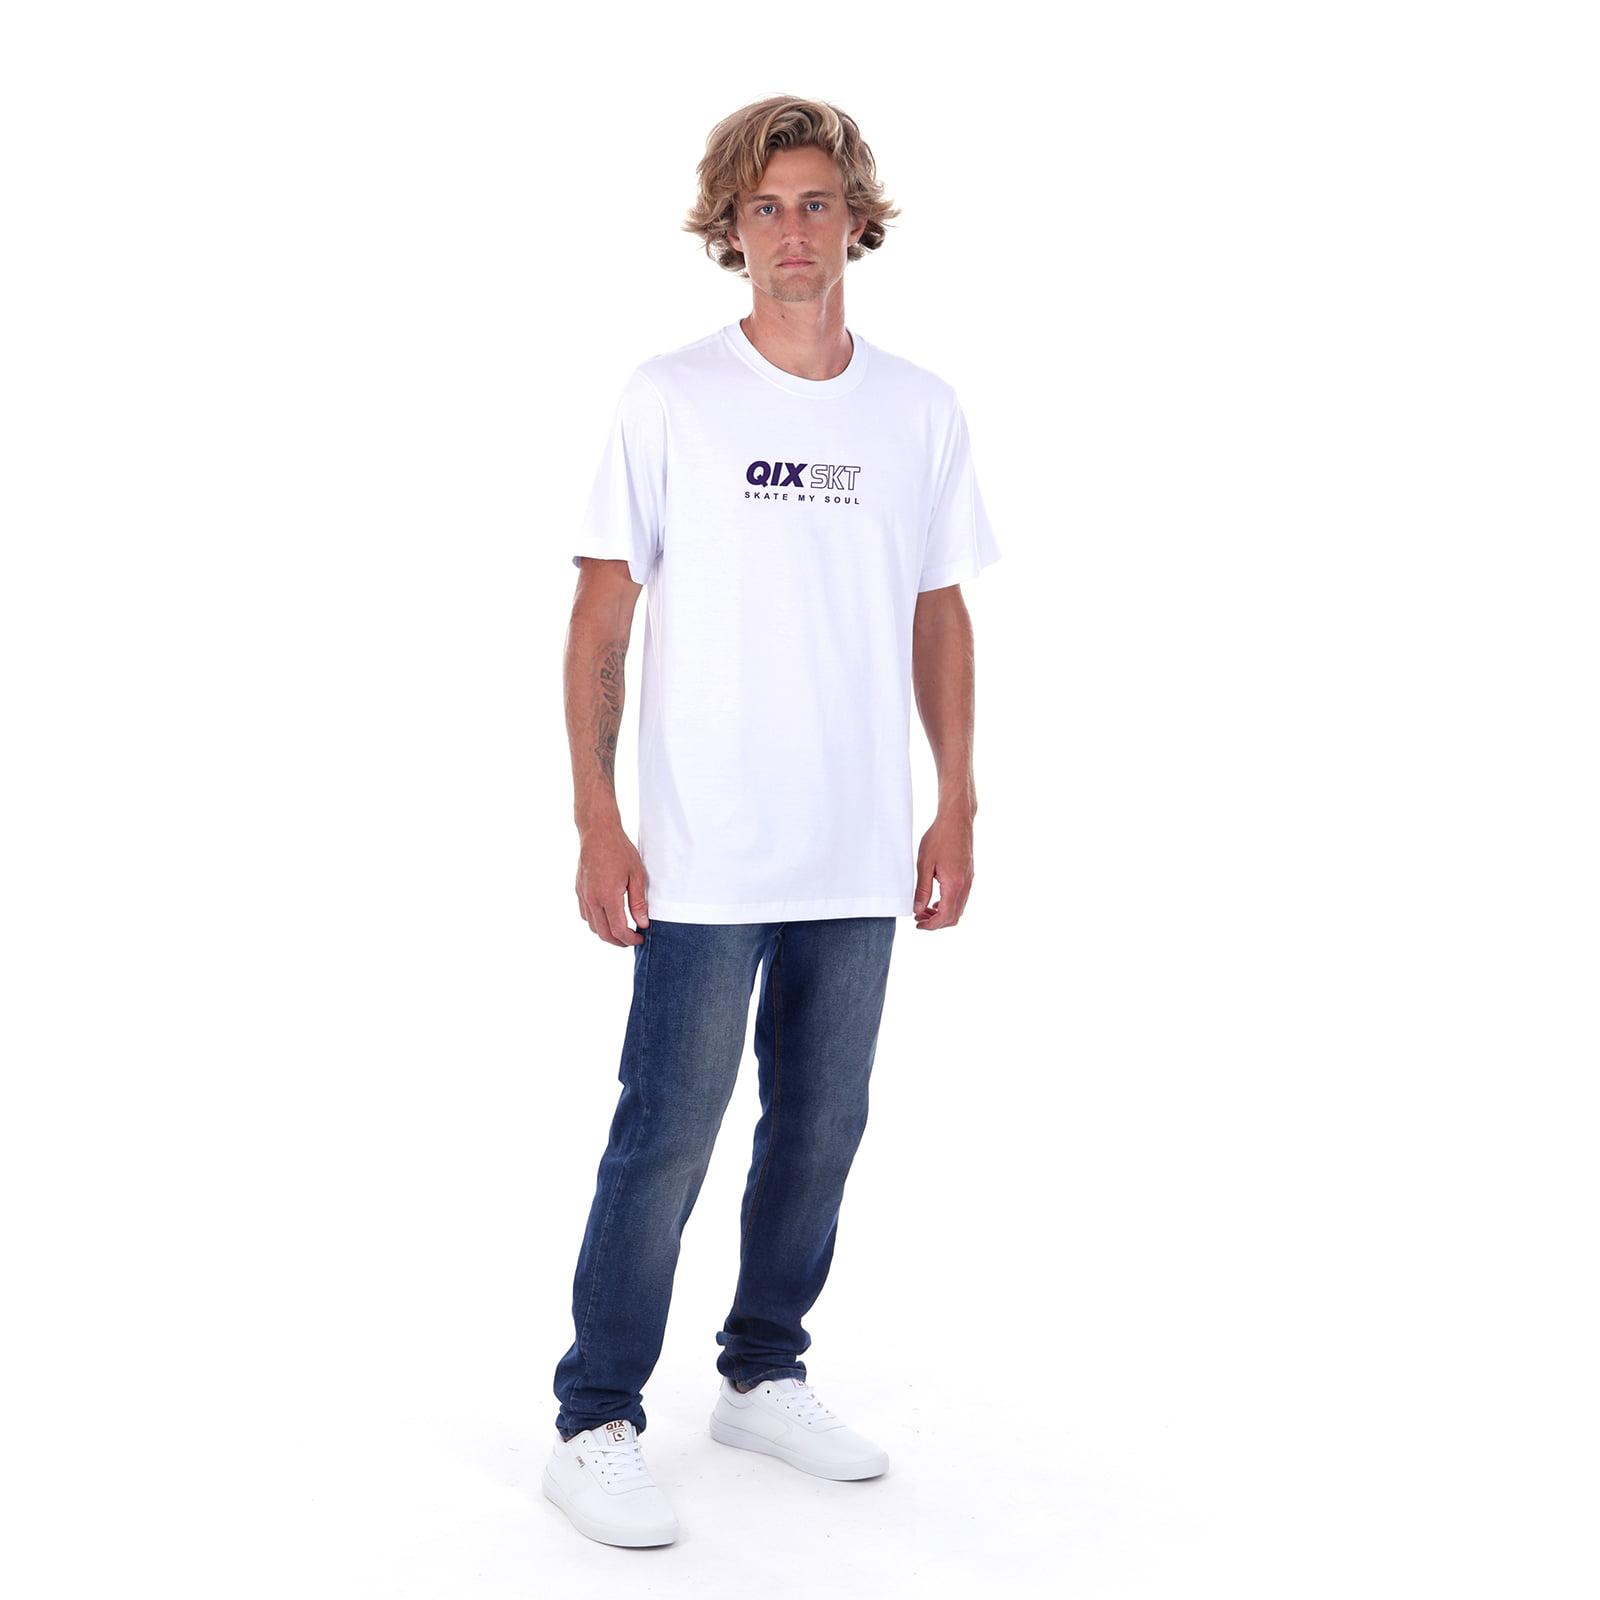 Camiseta Qix Skate My Soul